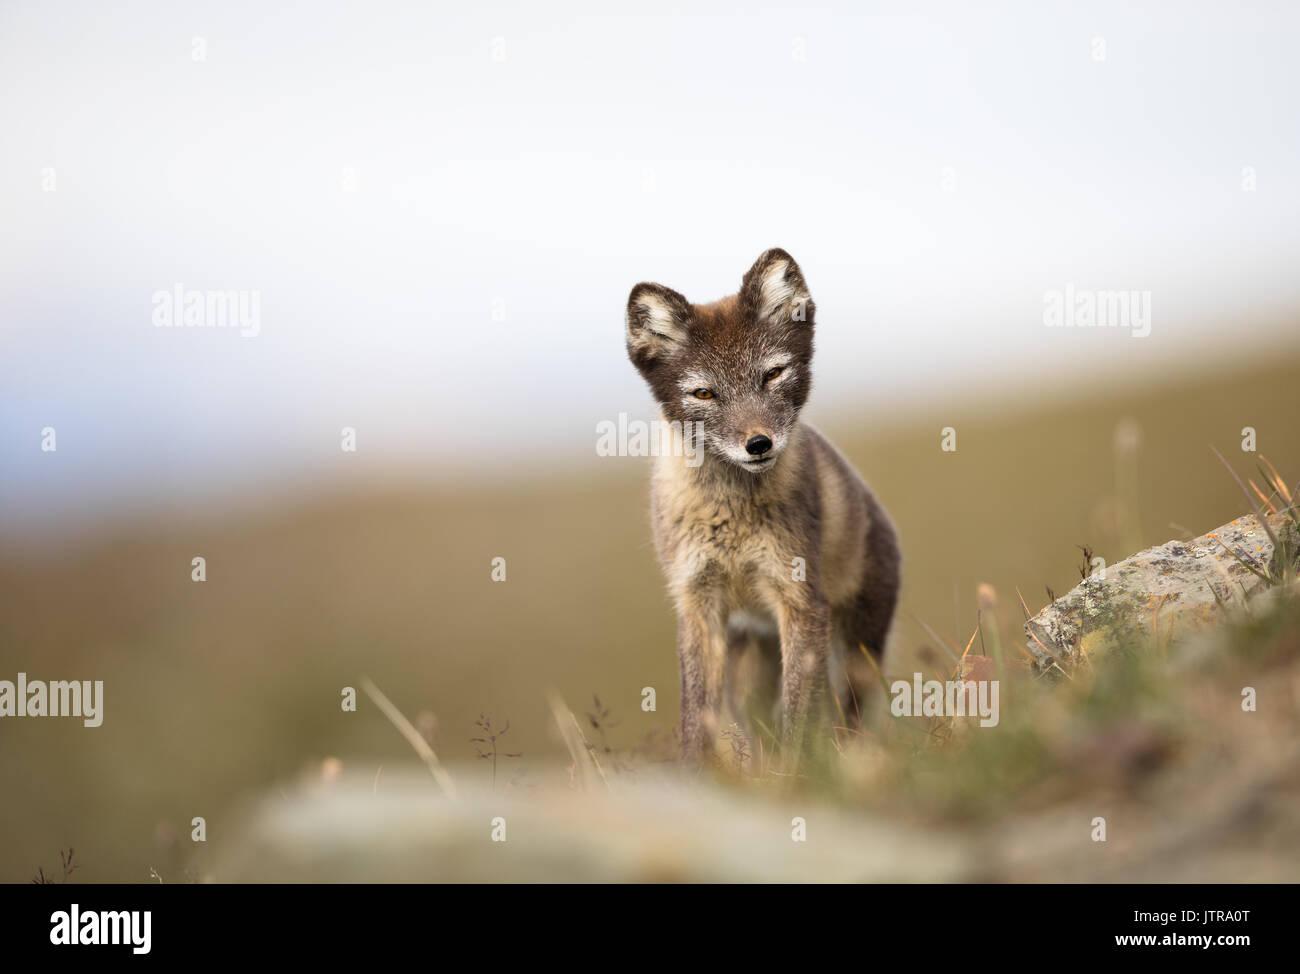 Arctic Fox, Vulpes lagopus, cub in natural habitat, summer in Svalbard Norway - Stock Image